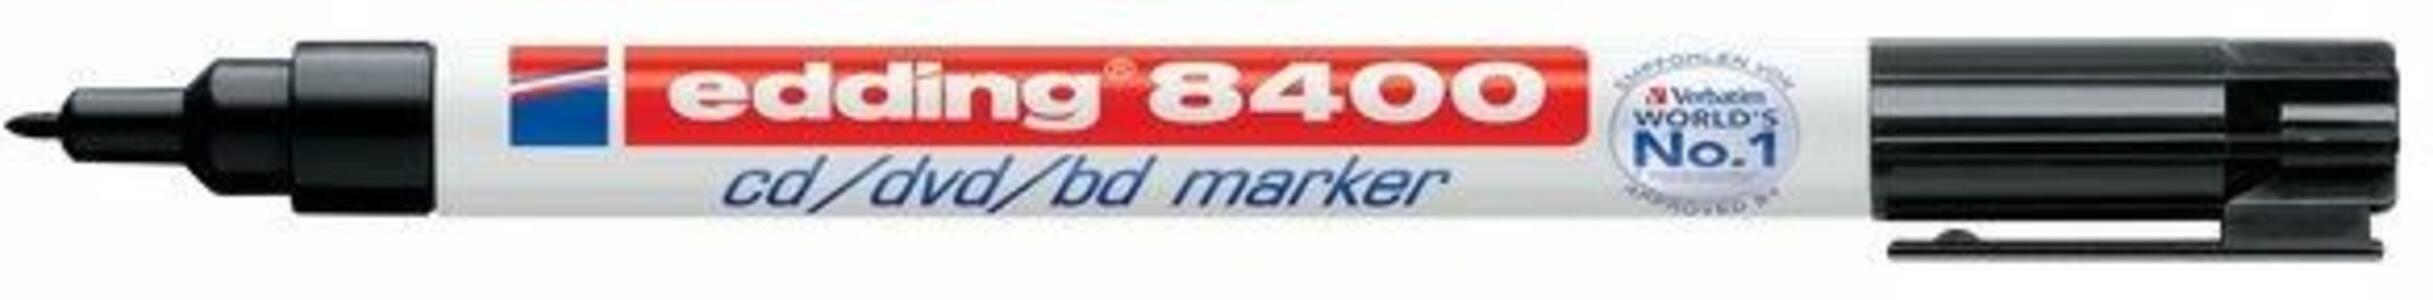 Marcatore per CD/DVD Edding 8400 nero